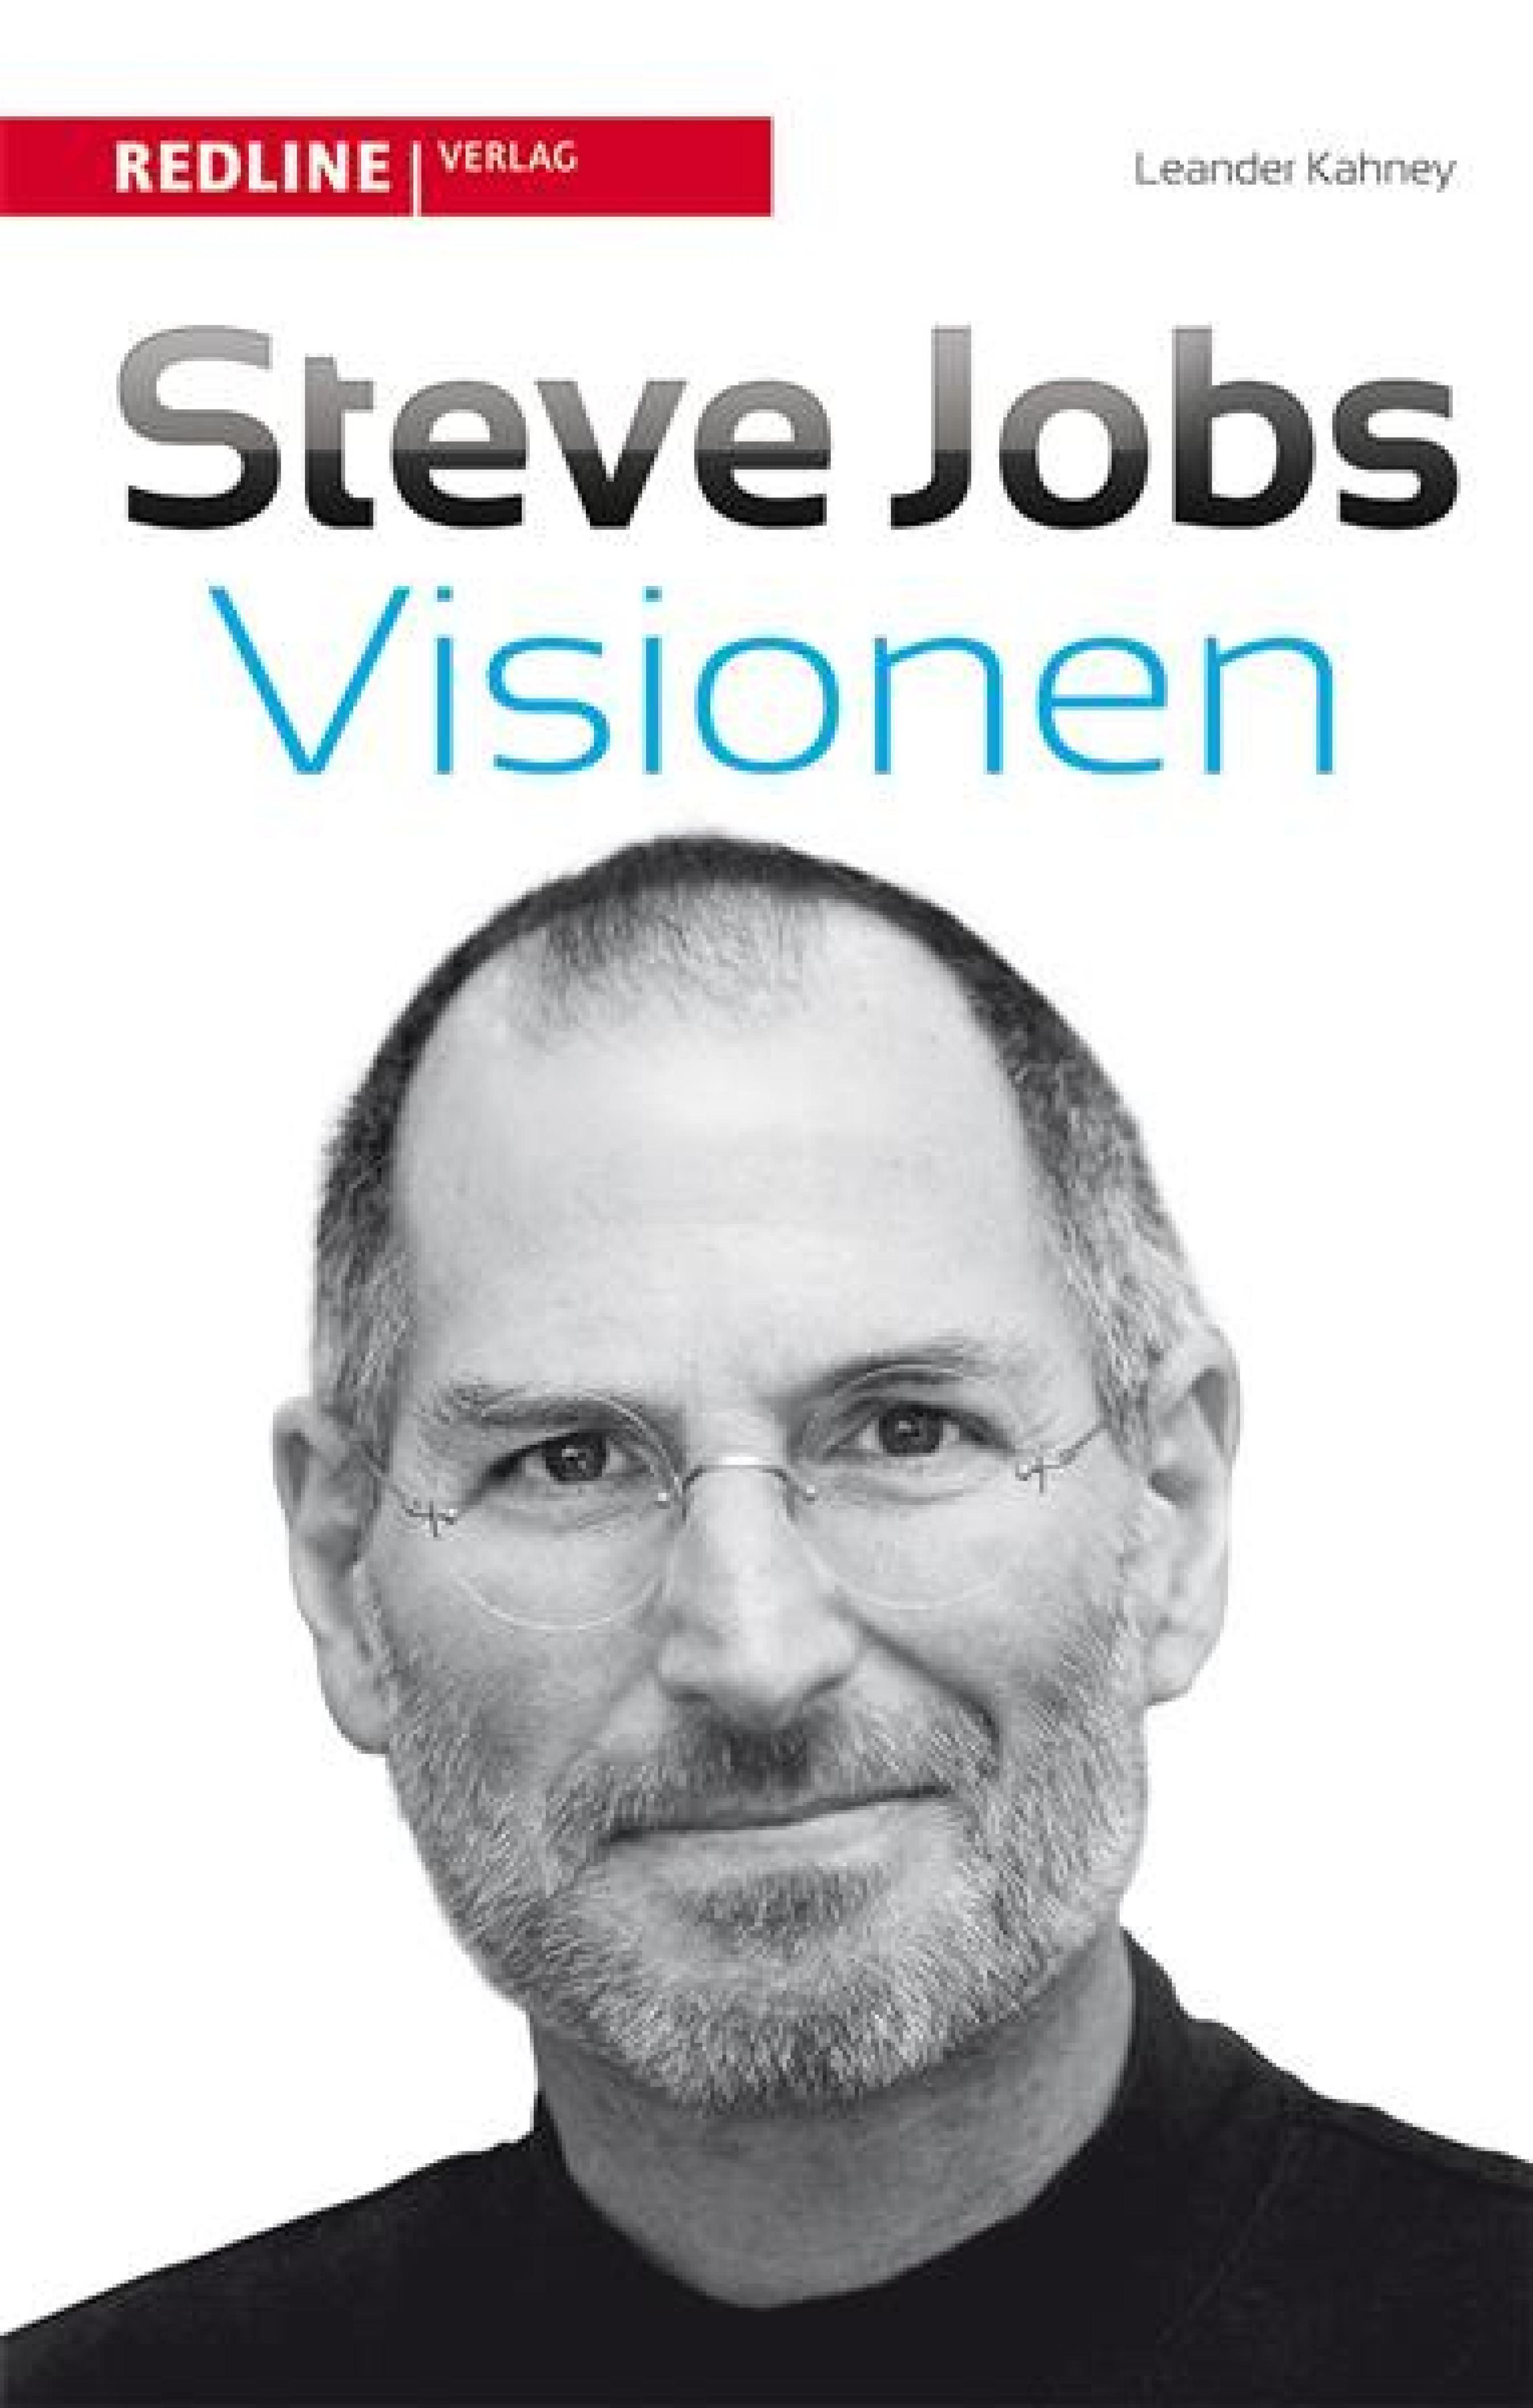 Steve jobs visionen ebook 9783864146619